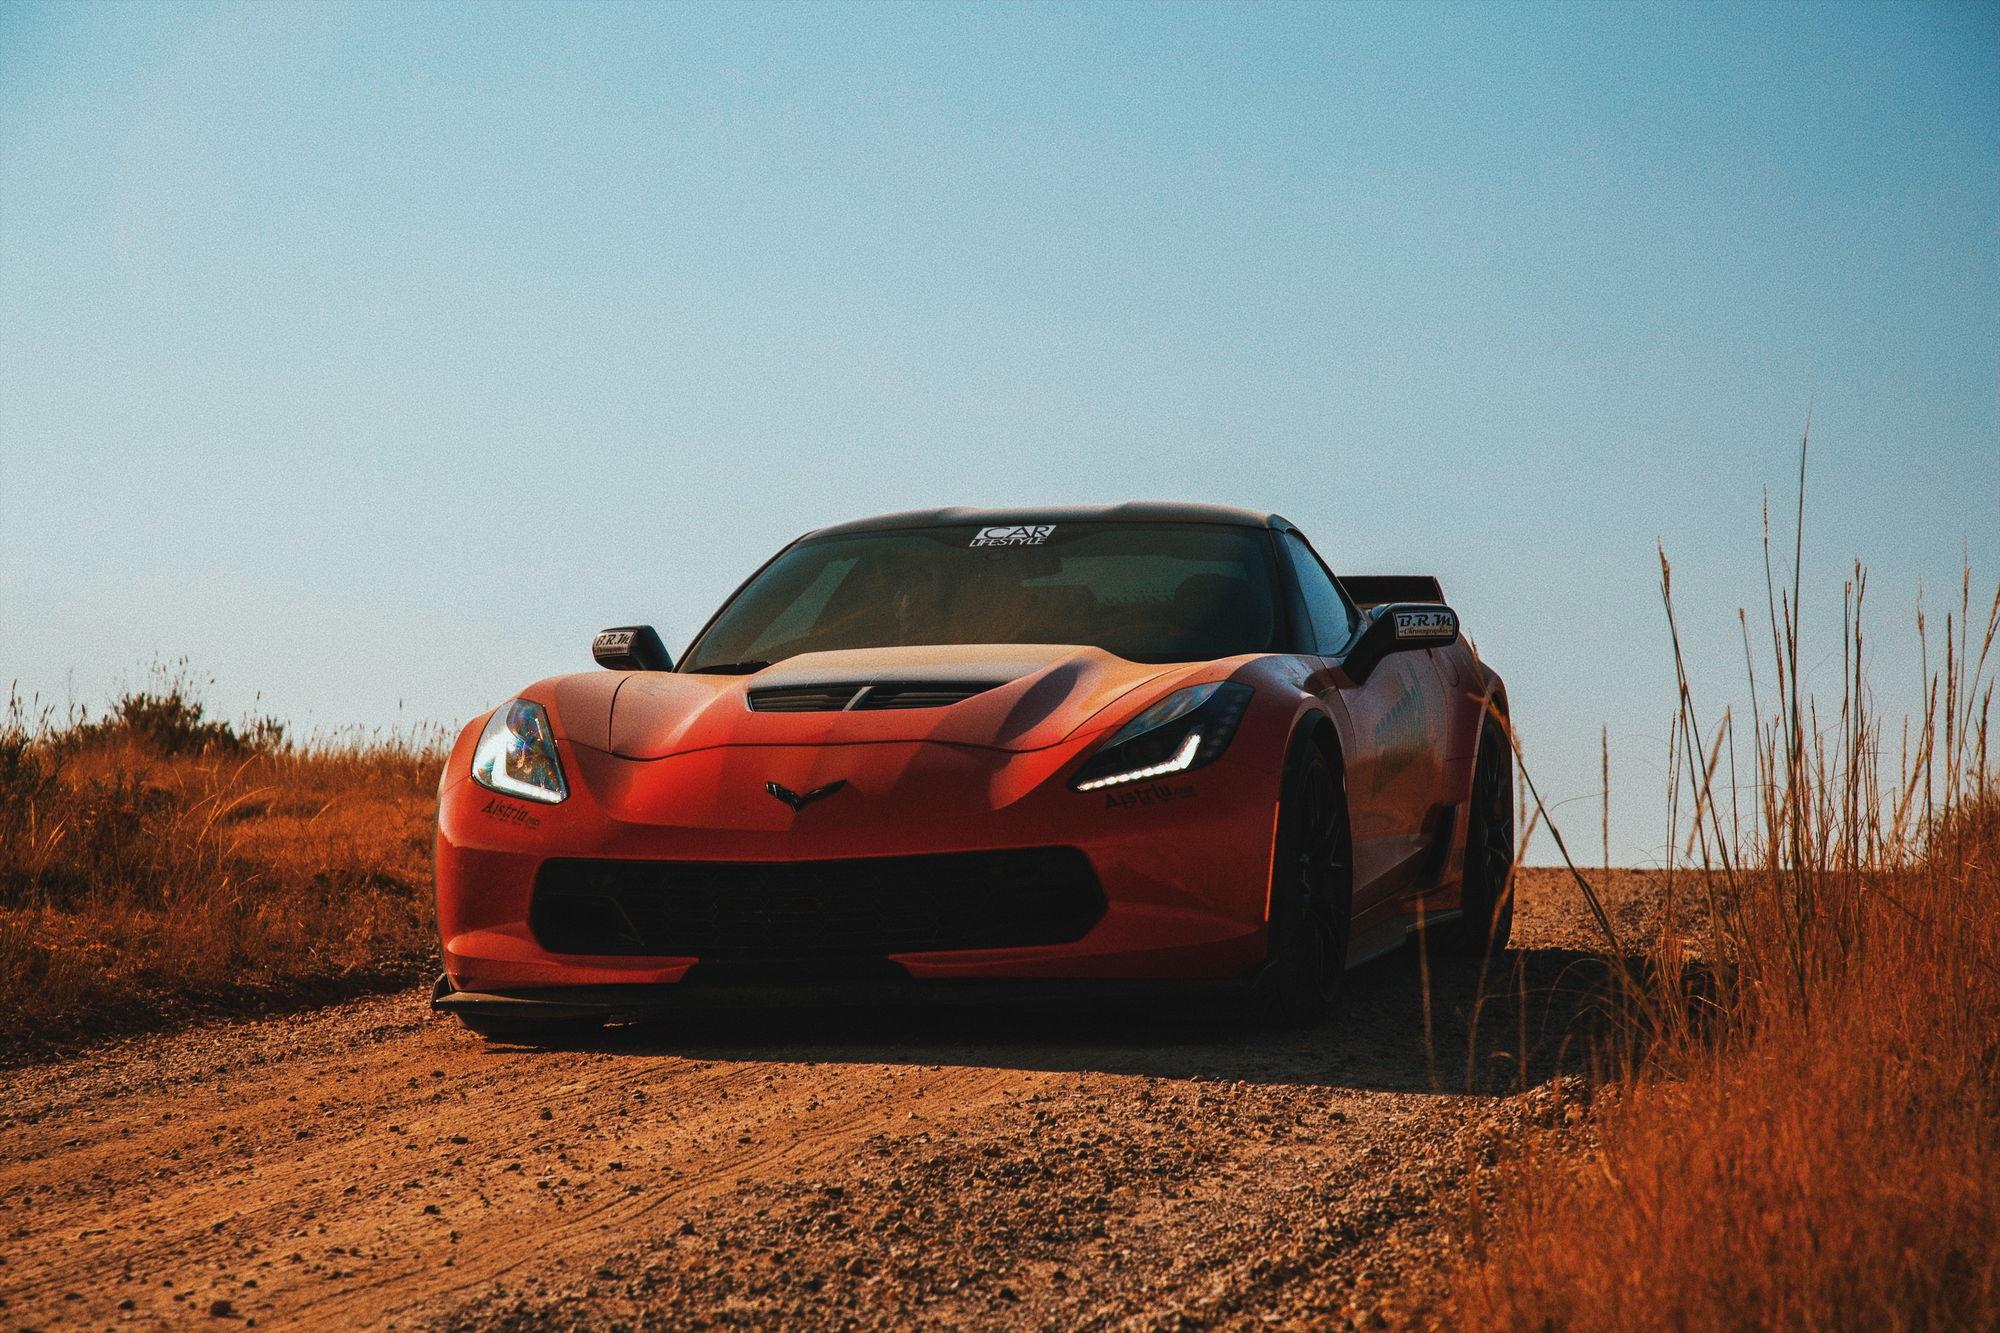 Xpel Stealth Z06 - CorvetteForum - Chevrolet Corvette Forum Discussion